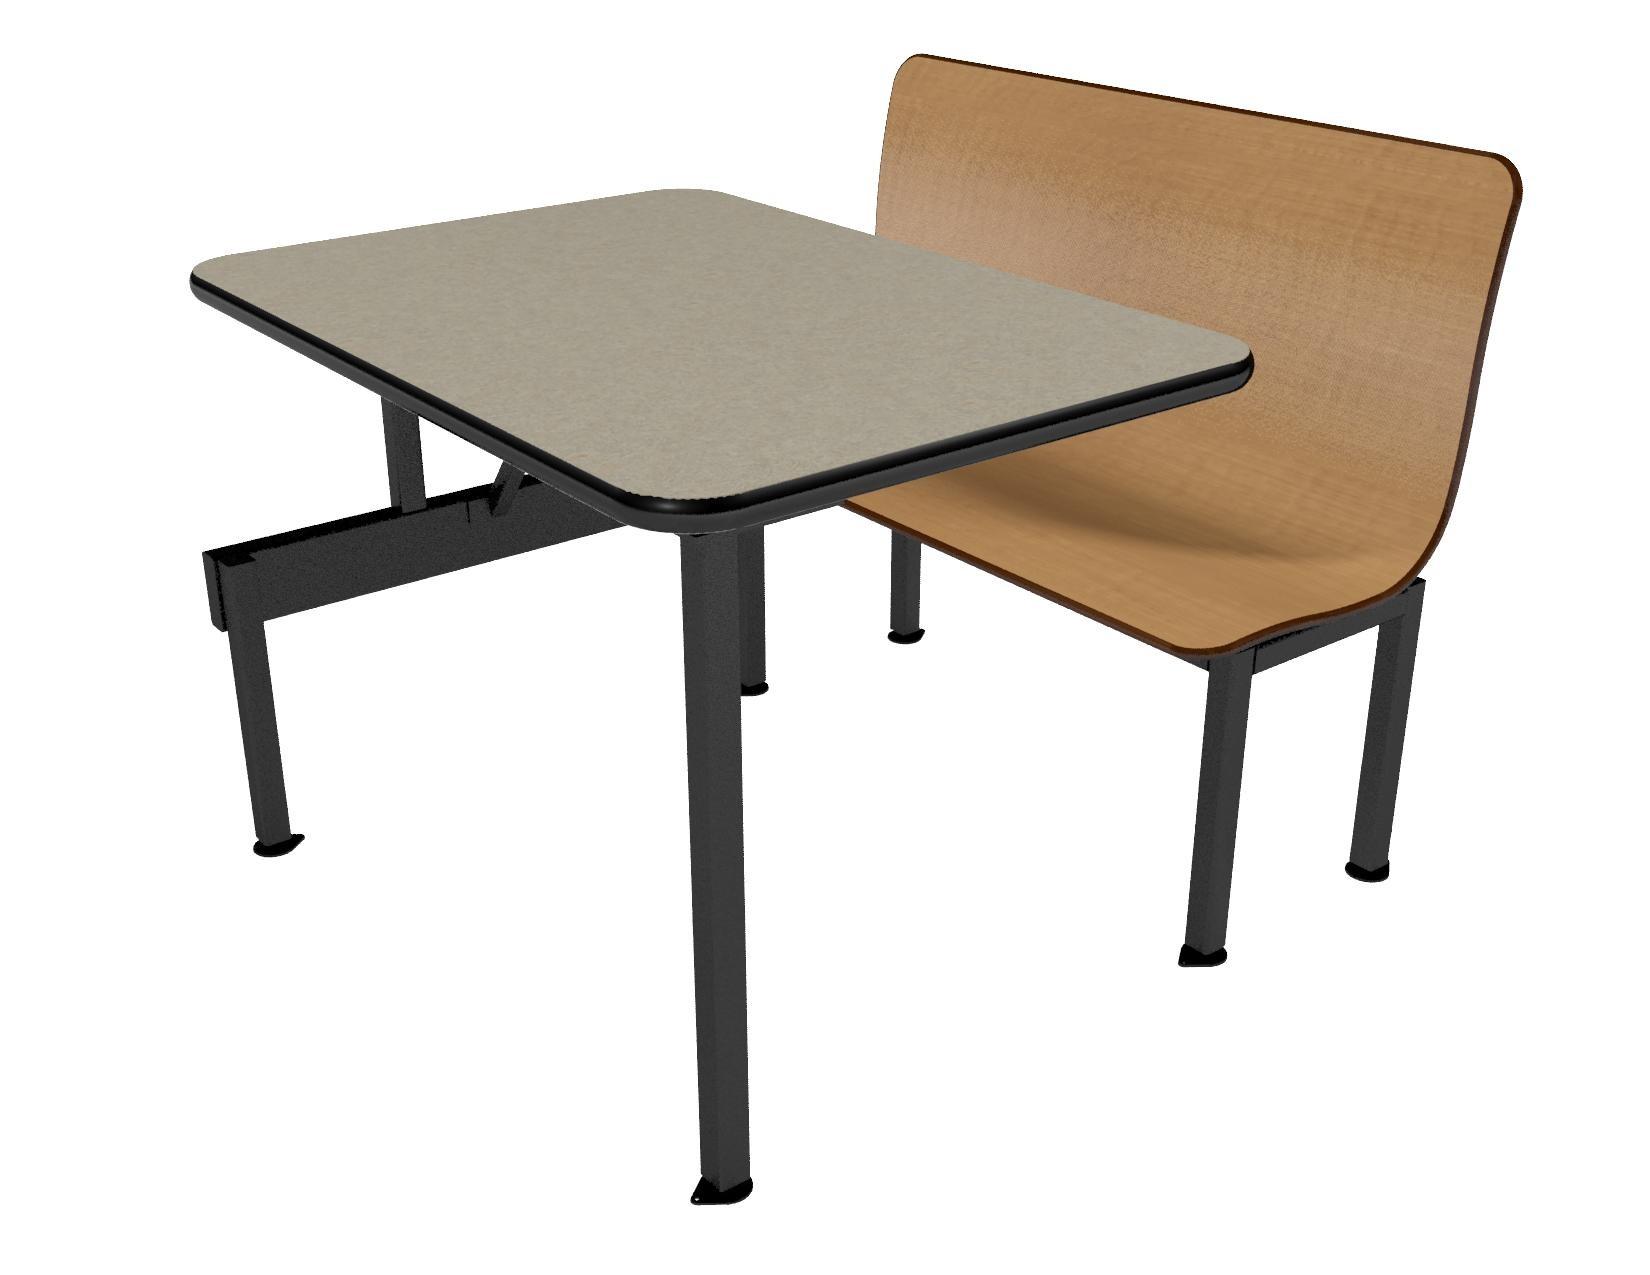 Monticello Maple benches, Bronze Legacy table top with Black Vinyl Edge